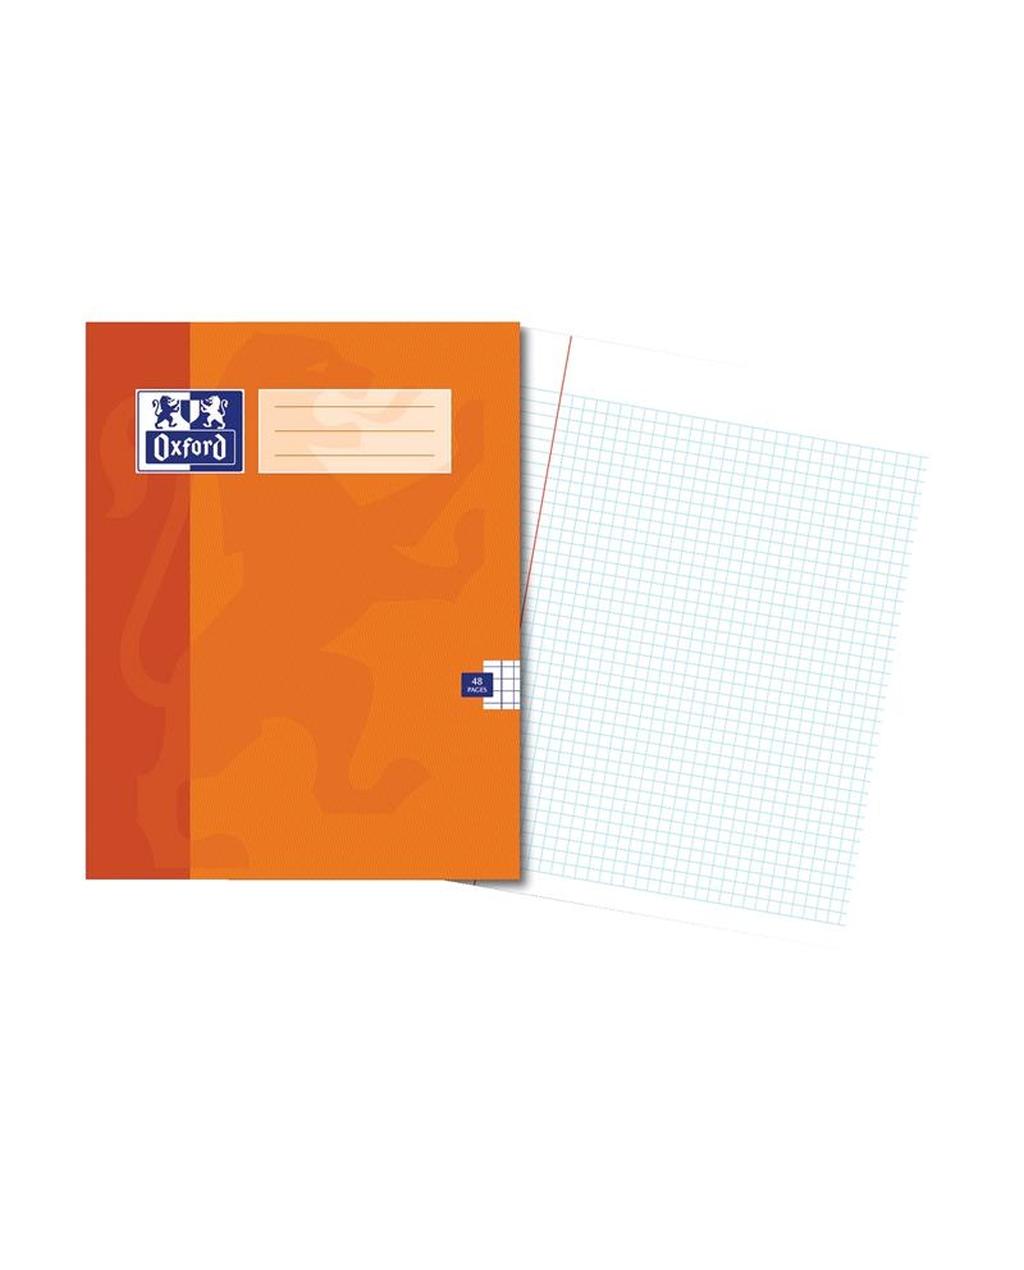 220x170 Oxford Ex Bk 48Pg 8Mm Mar Orange